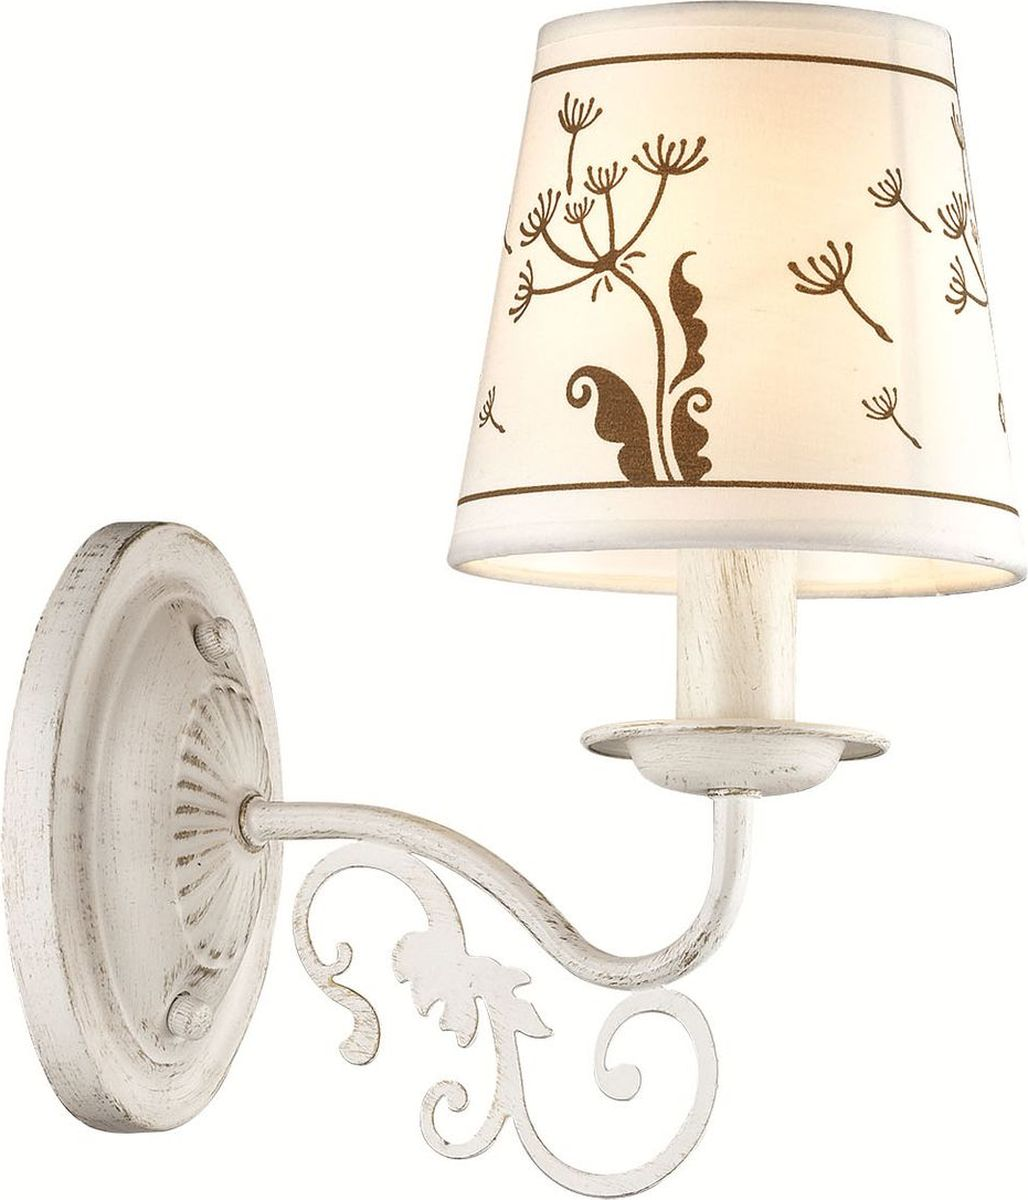 Бра Lumion Zinetta White, цвет: белый, E14, 40 Вт. 3205/1W3205/1W